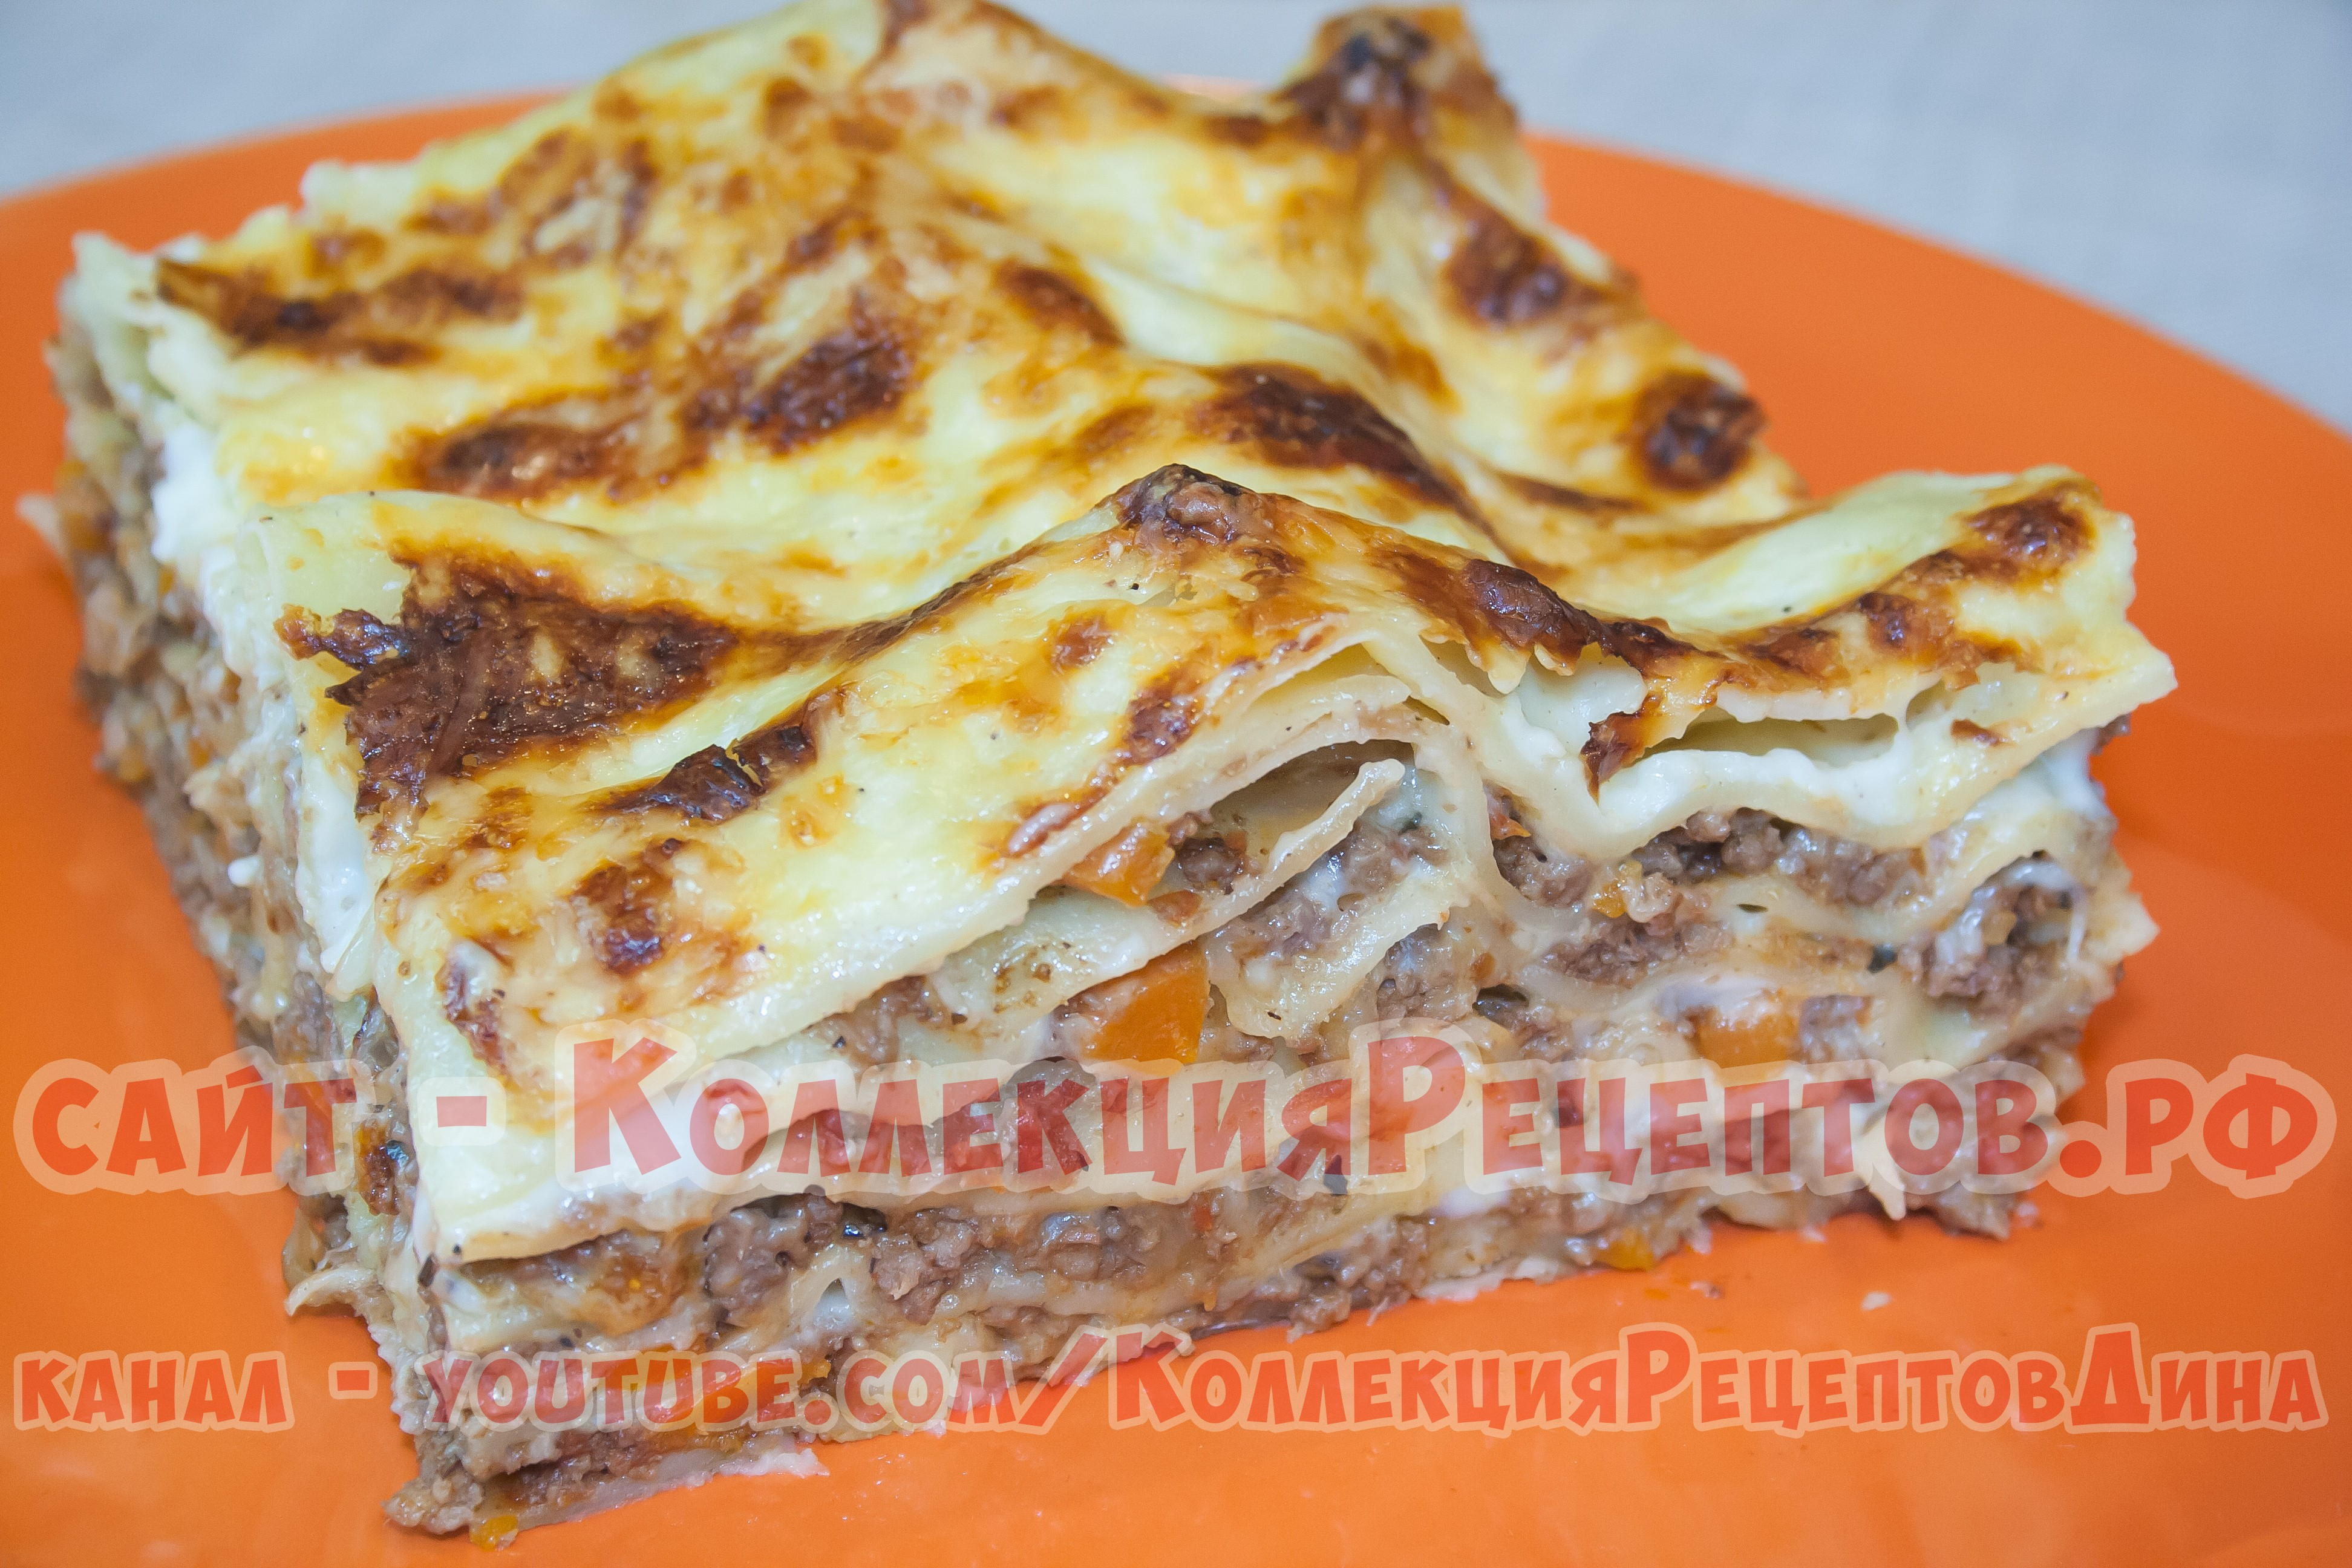 Лазанья из кабачка с фаршем рецепт в домашних условиях